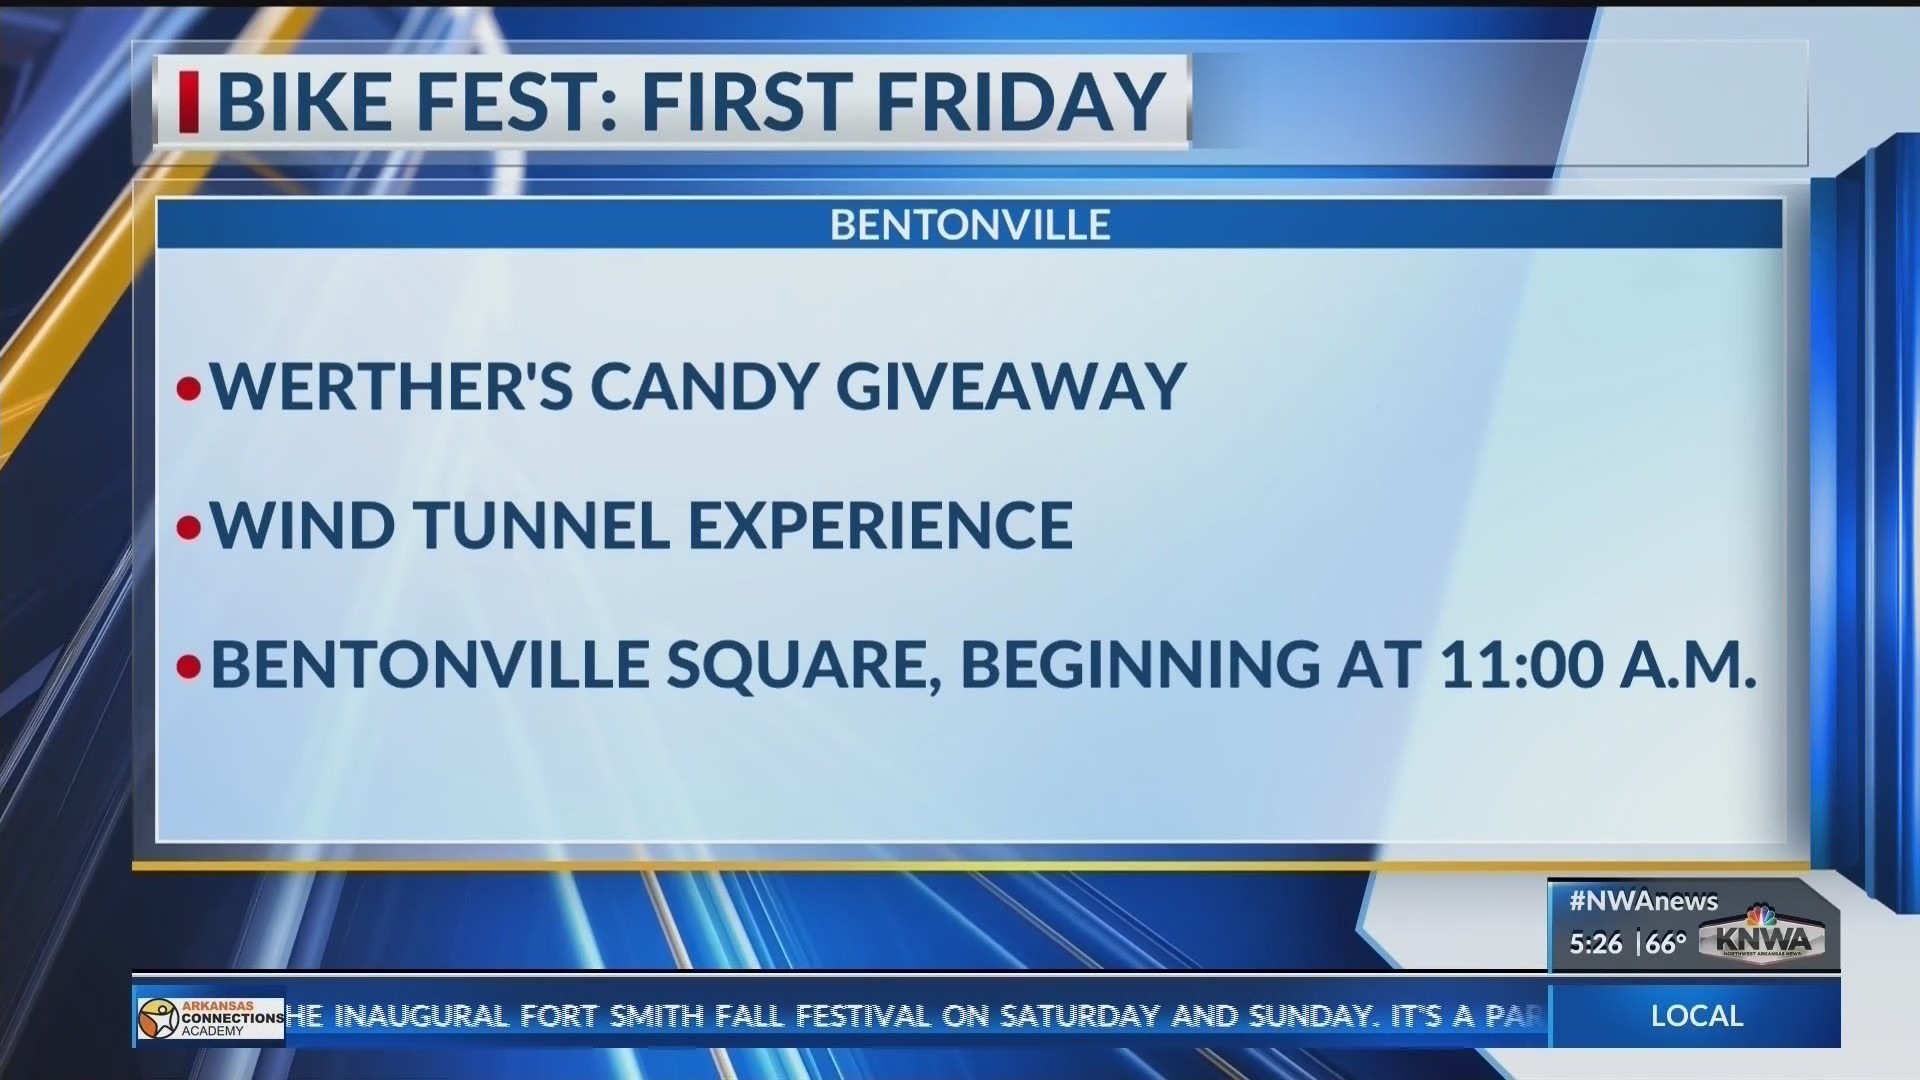 NWA_Residents_Invited_to_Bentonville_Bik_0_20181005110318